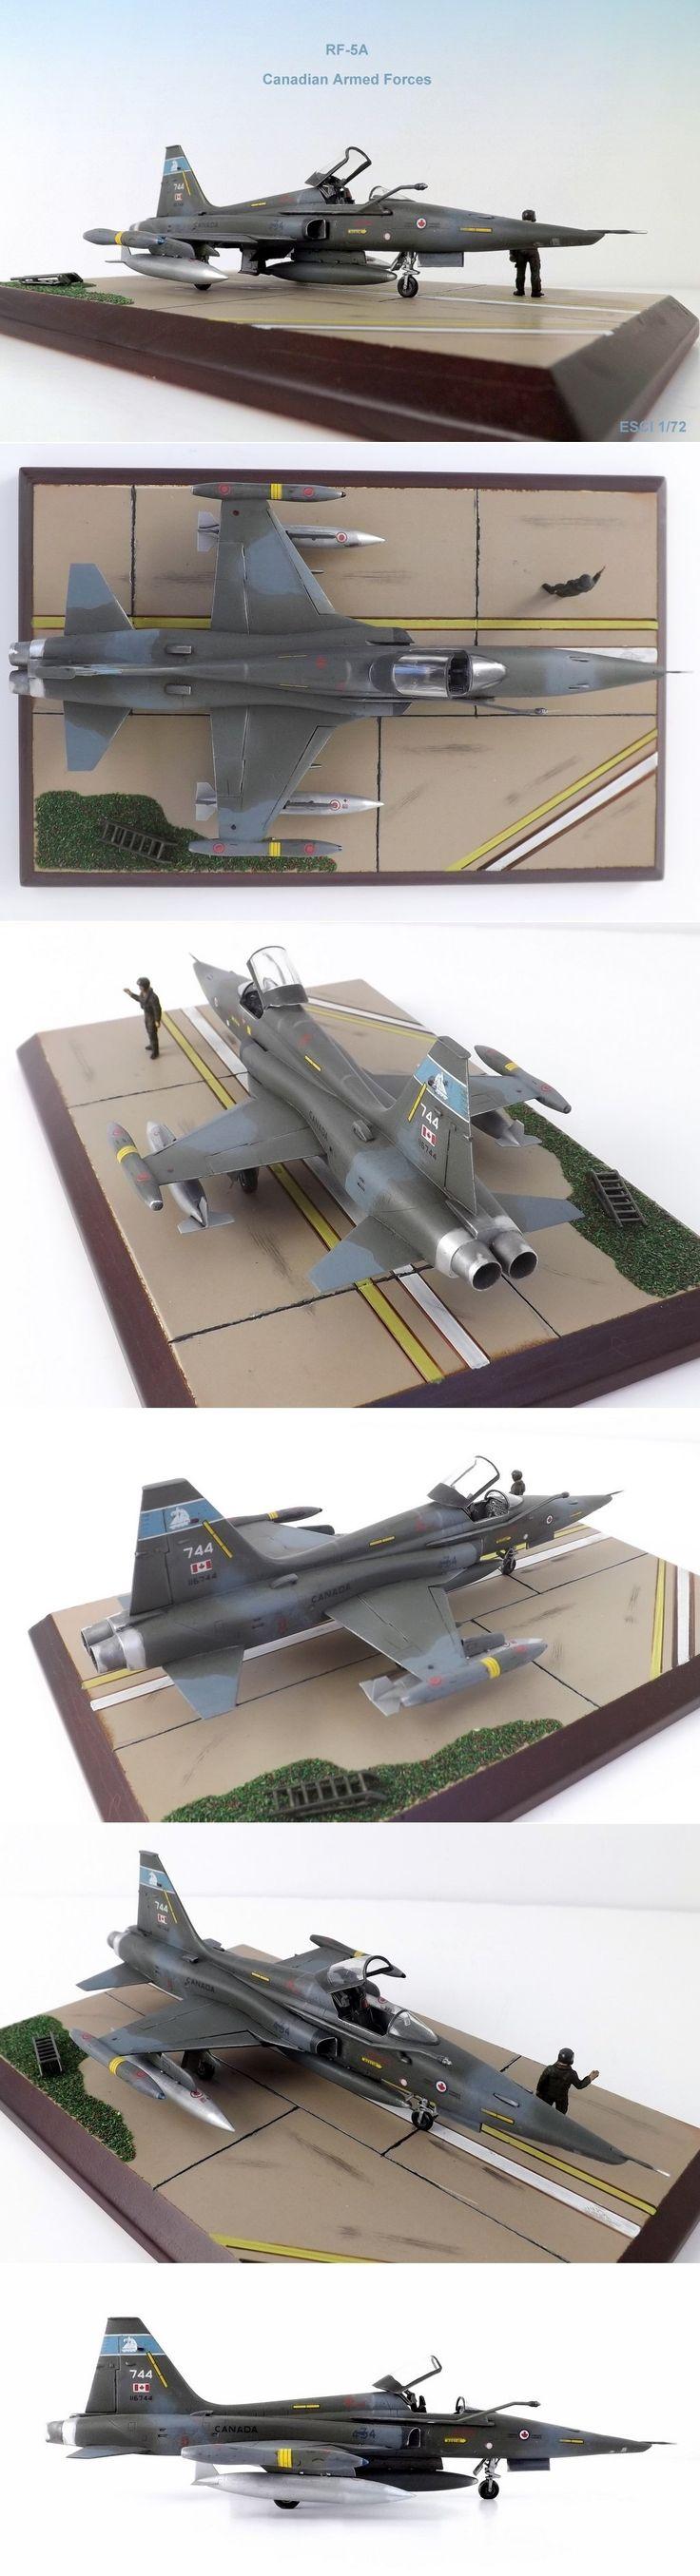 ESCI's little RF-5A in 1/72 scale. http://www.network54.com/Forum/47751/message/1418126890/ESCI+F-5+Freedom+Fighter